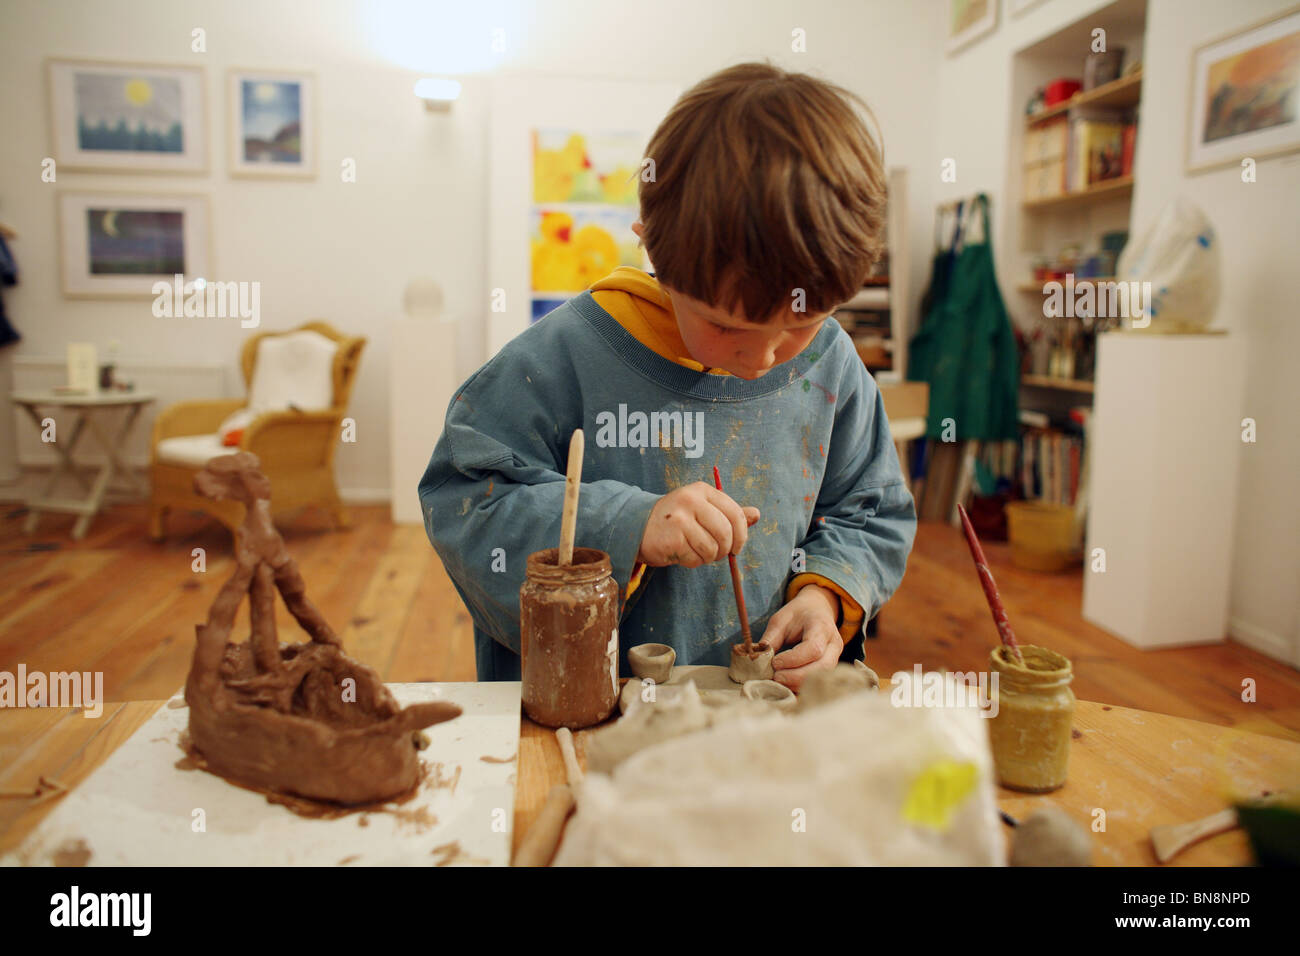 Boy making pottery - Stock Image